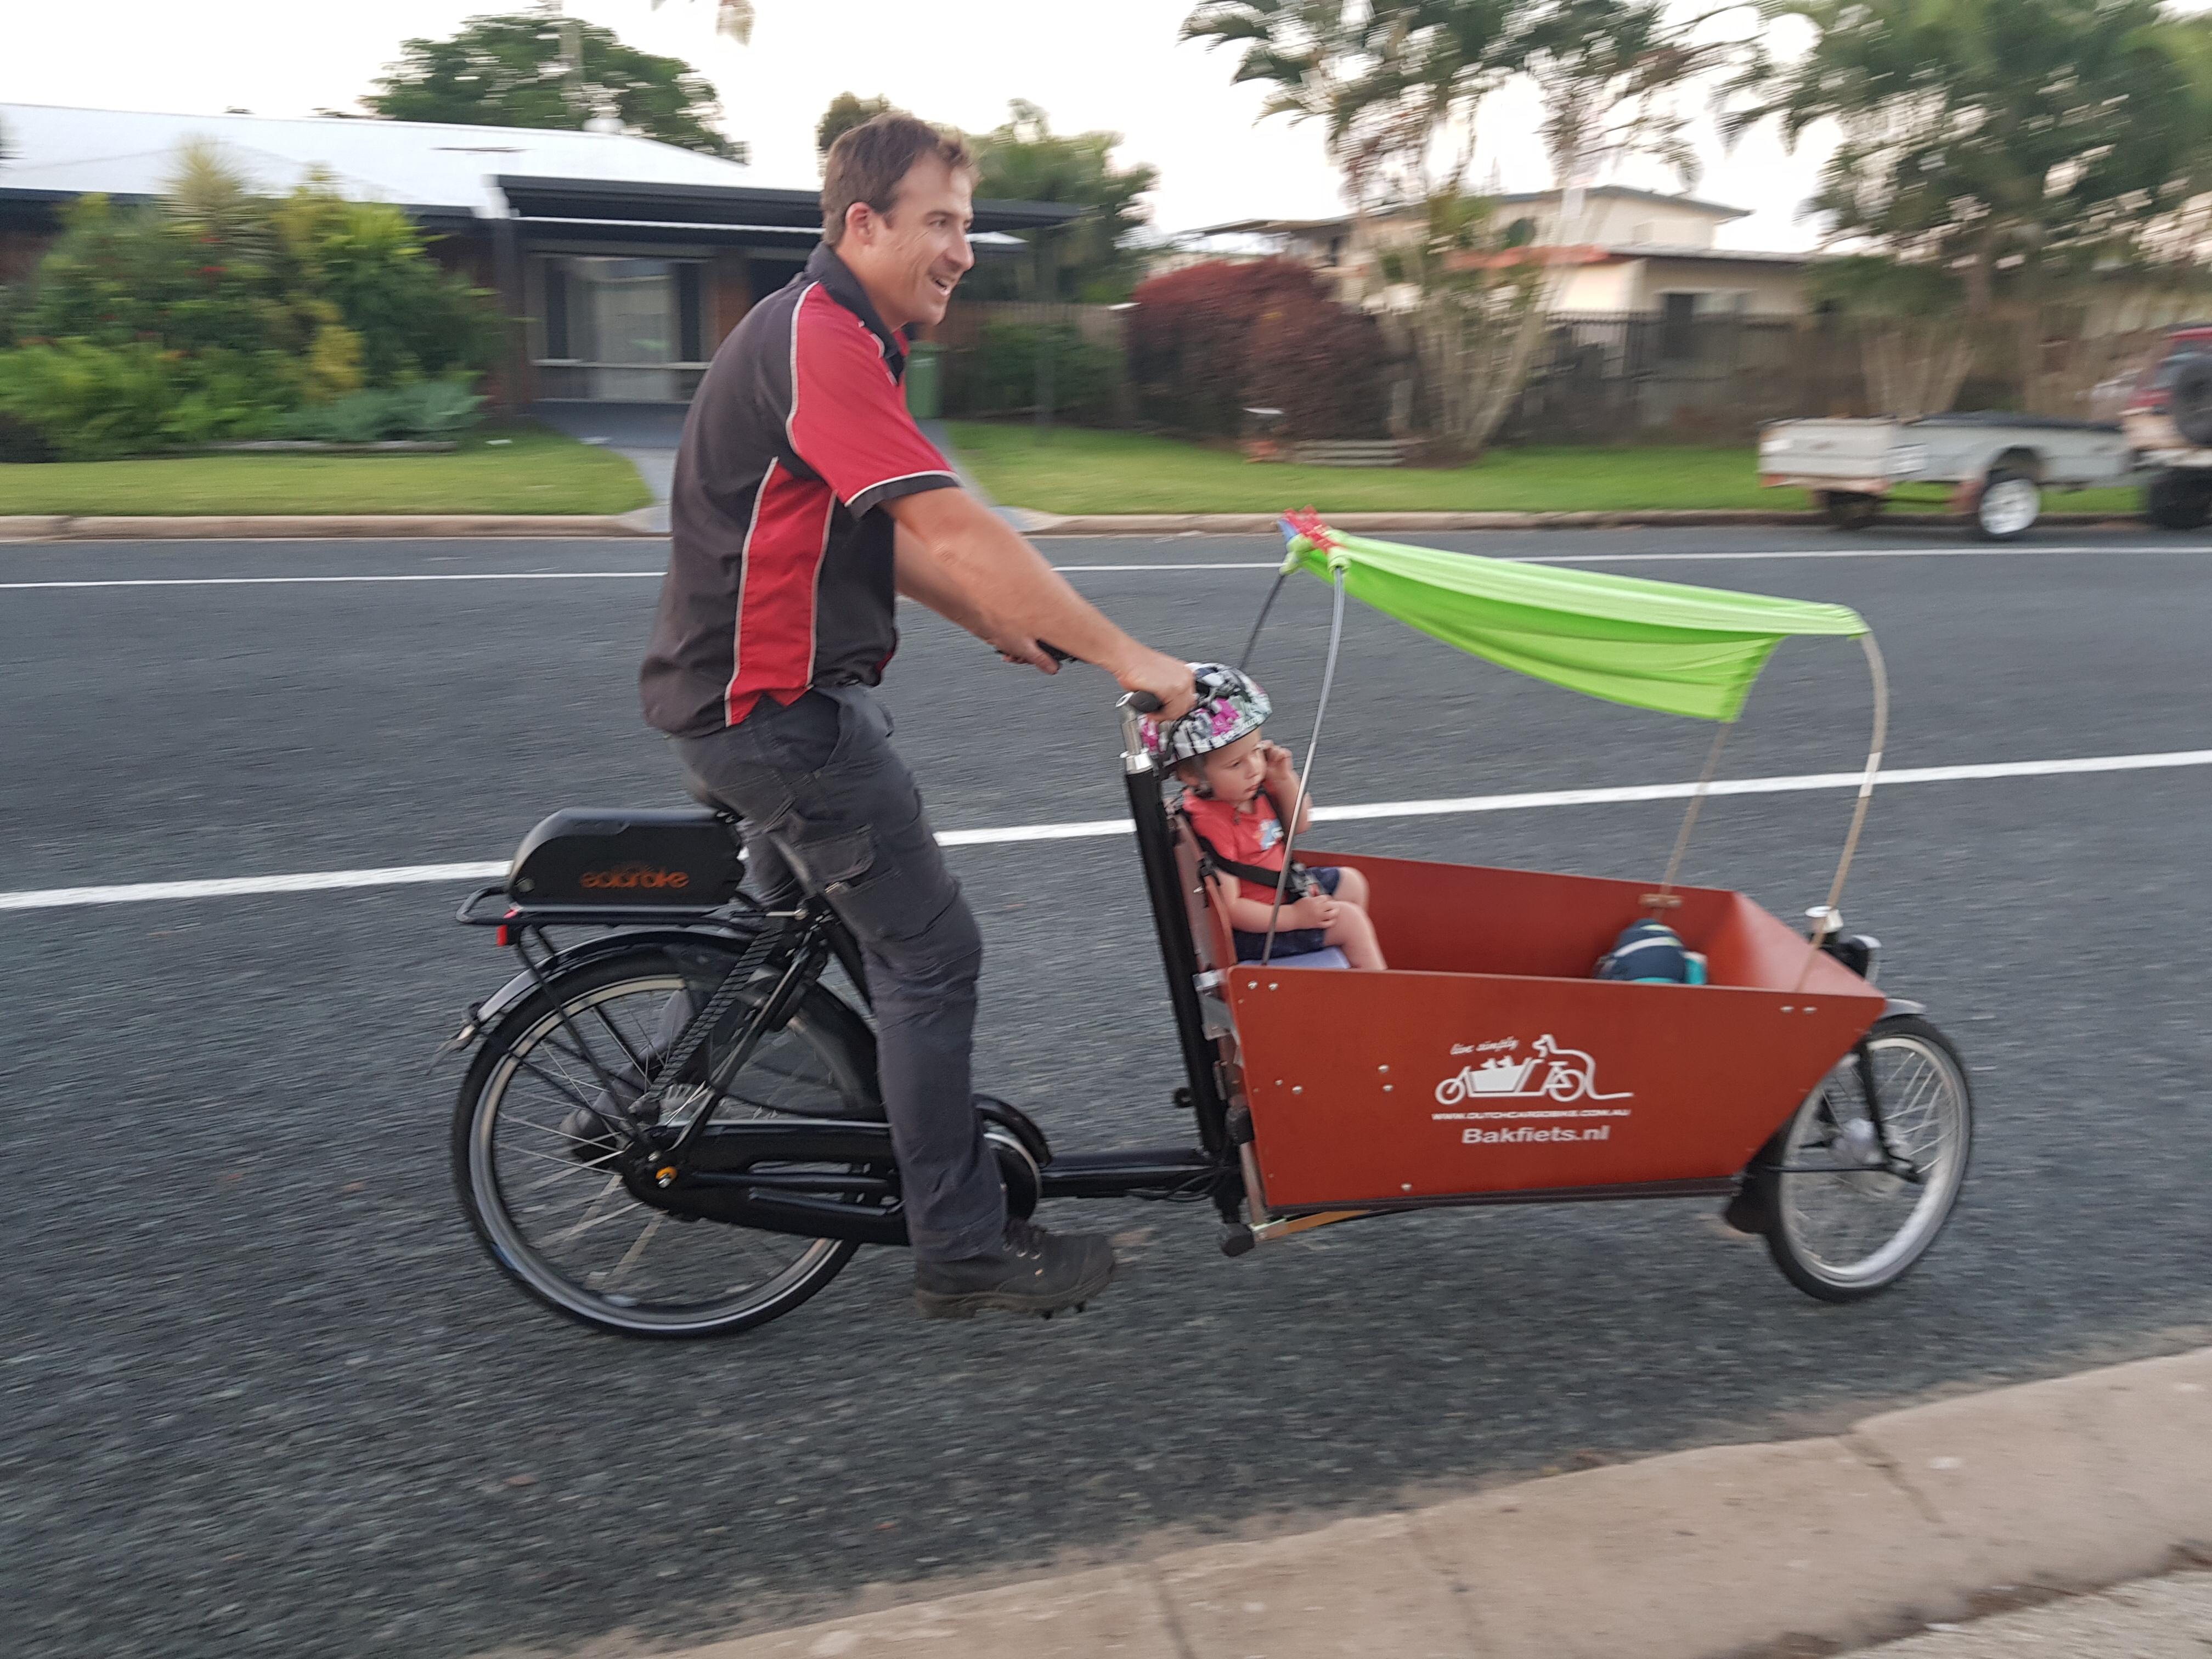 848c1fa4a31 SOLAR BIKE - SOLAR BIKE is an Australian Electric Bicycle Conversion ...